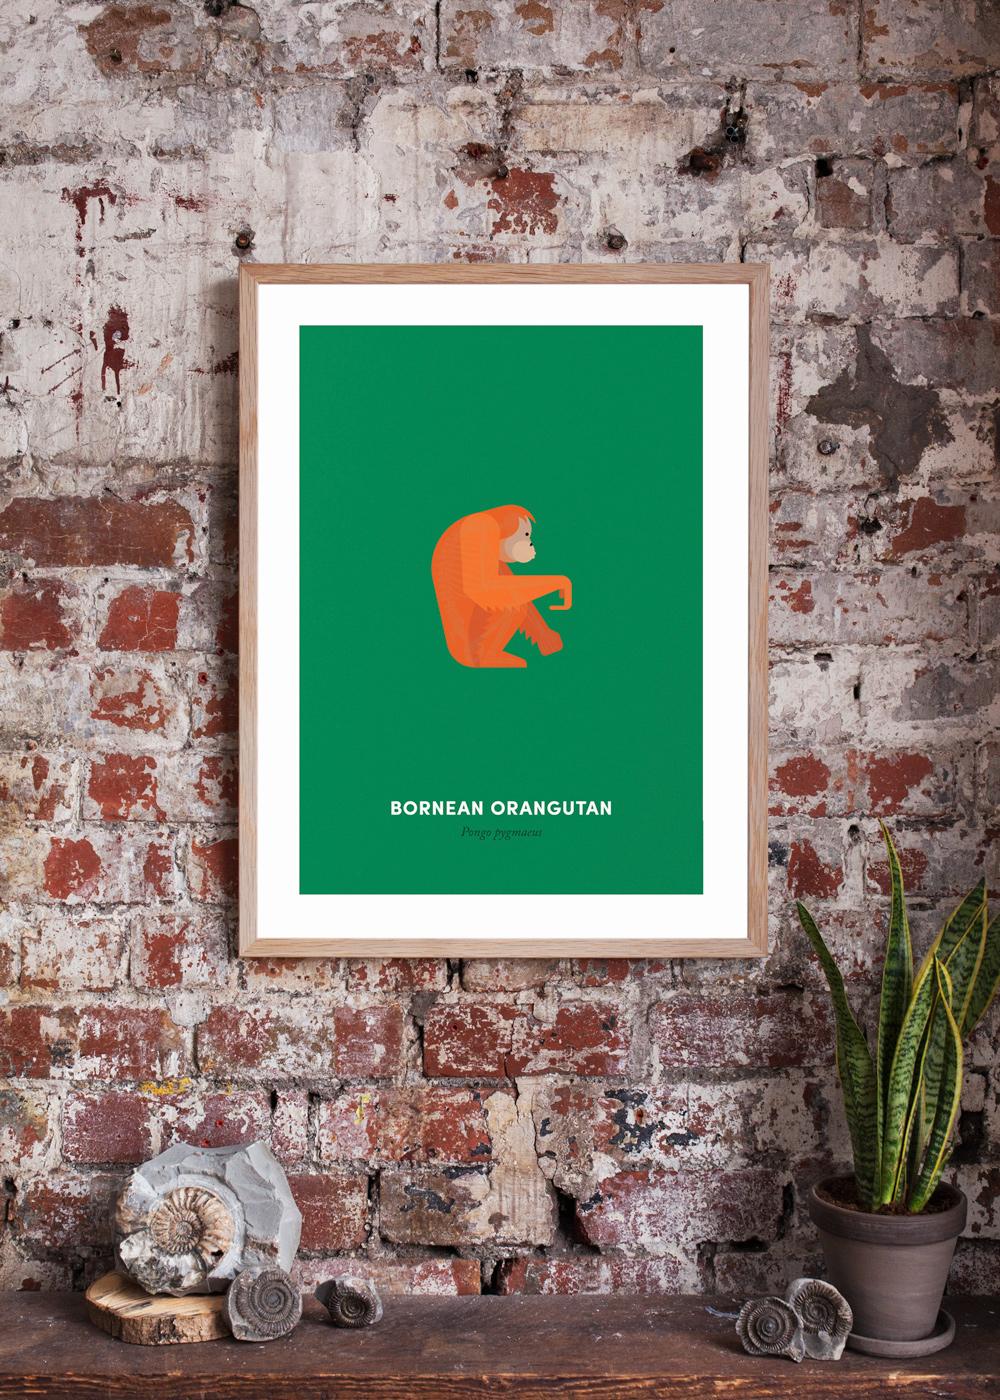 Orangutan-White-Wall-Product-Shot-Cropped2.jpg